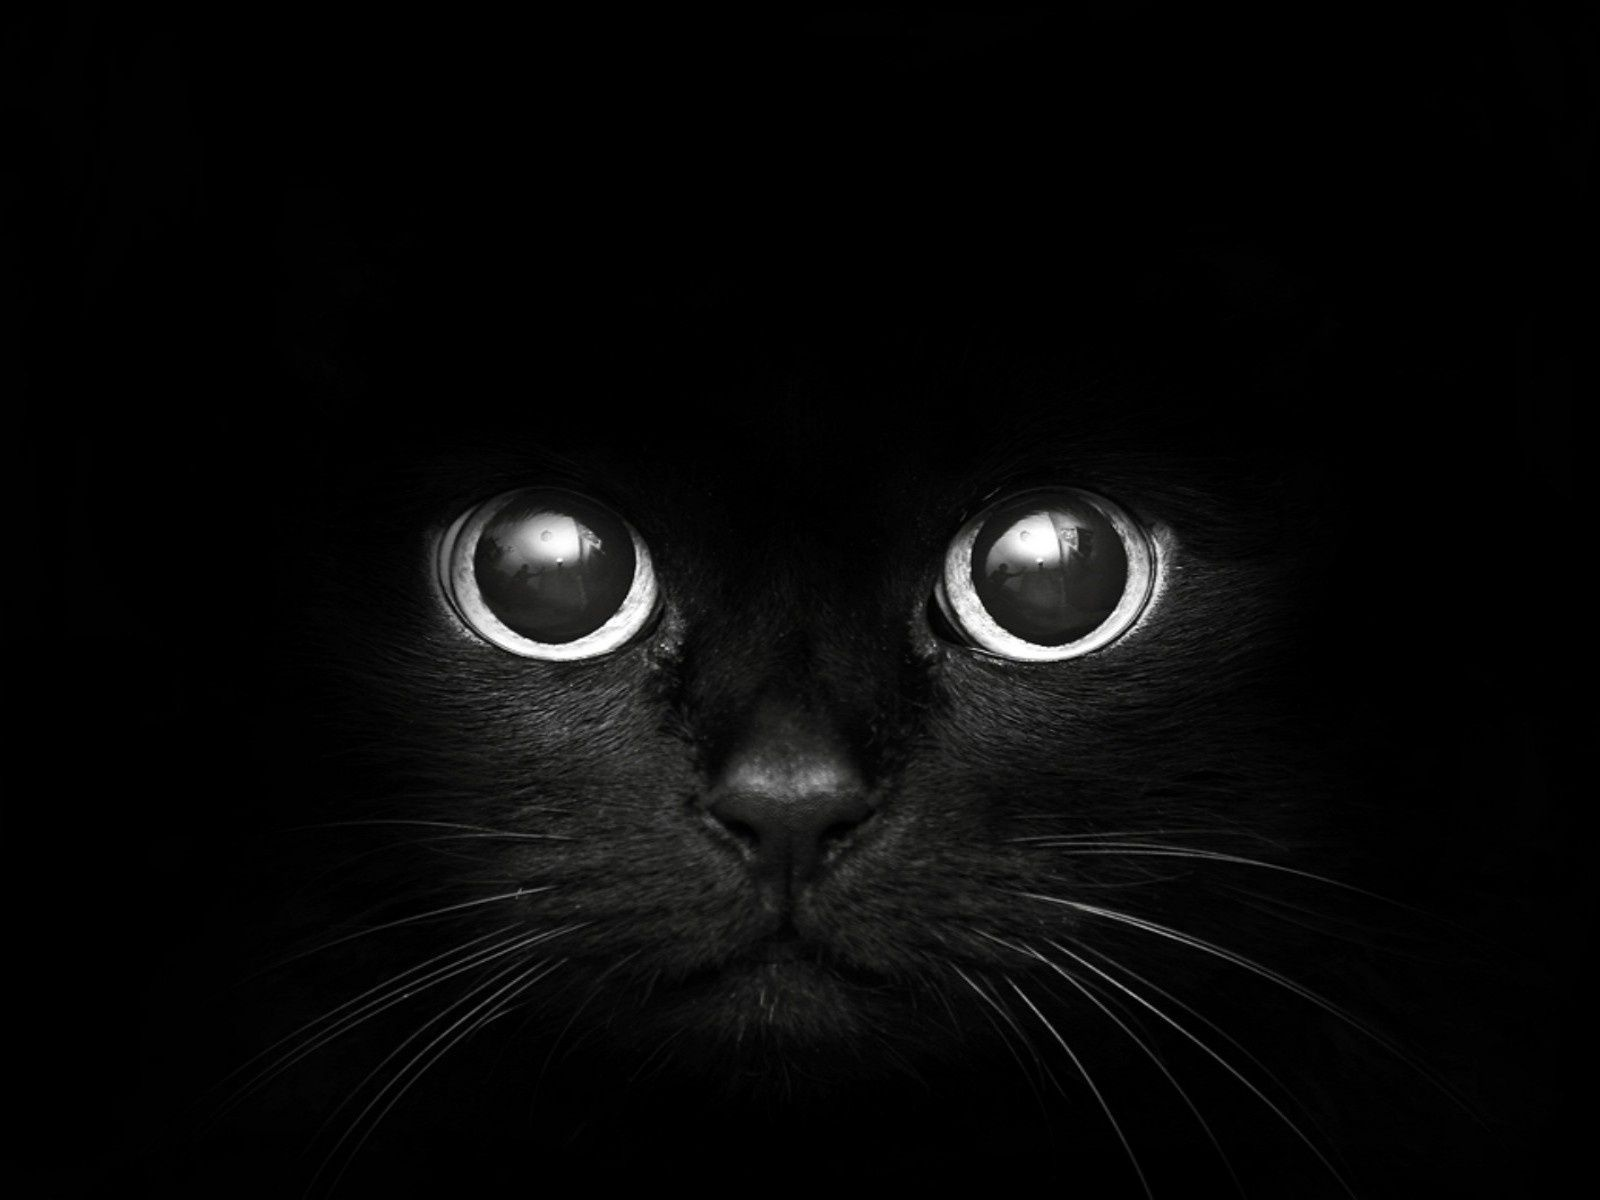 Cats Wallpapers Black Catblack Cat Hd Free Spot Cats Kittens